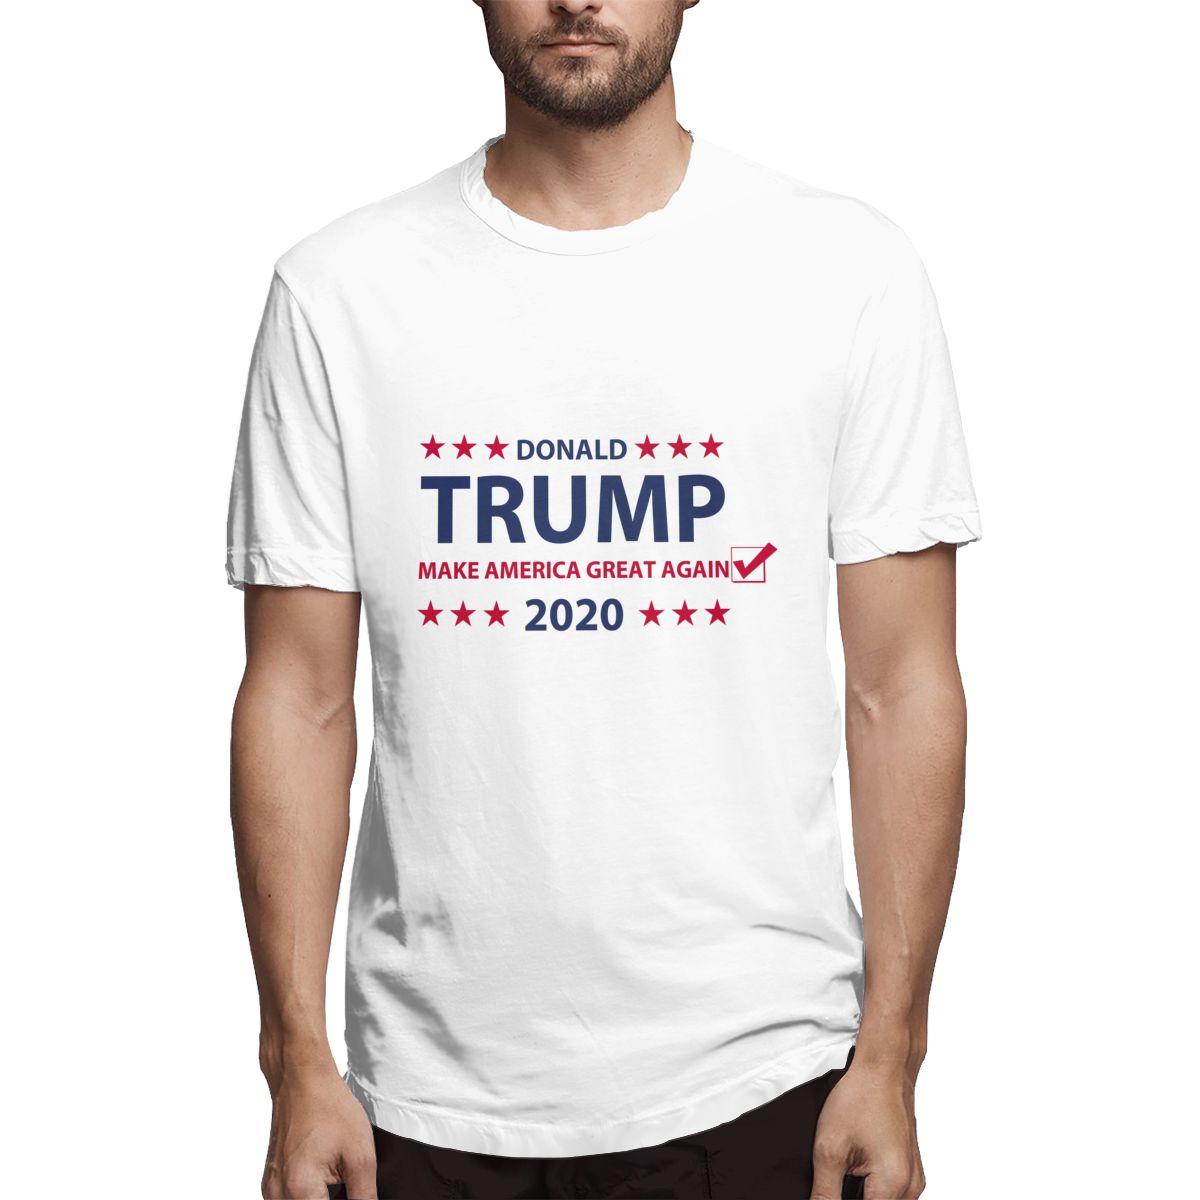 Camiseta de hombre estilo impreso manga corta Camiseta hombres Donald Trump 2020 taza de café moda comodidad hombre parte de arriba ropa informal Camisetas